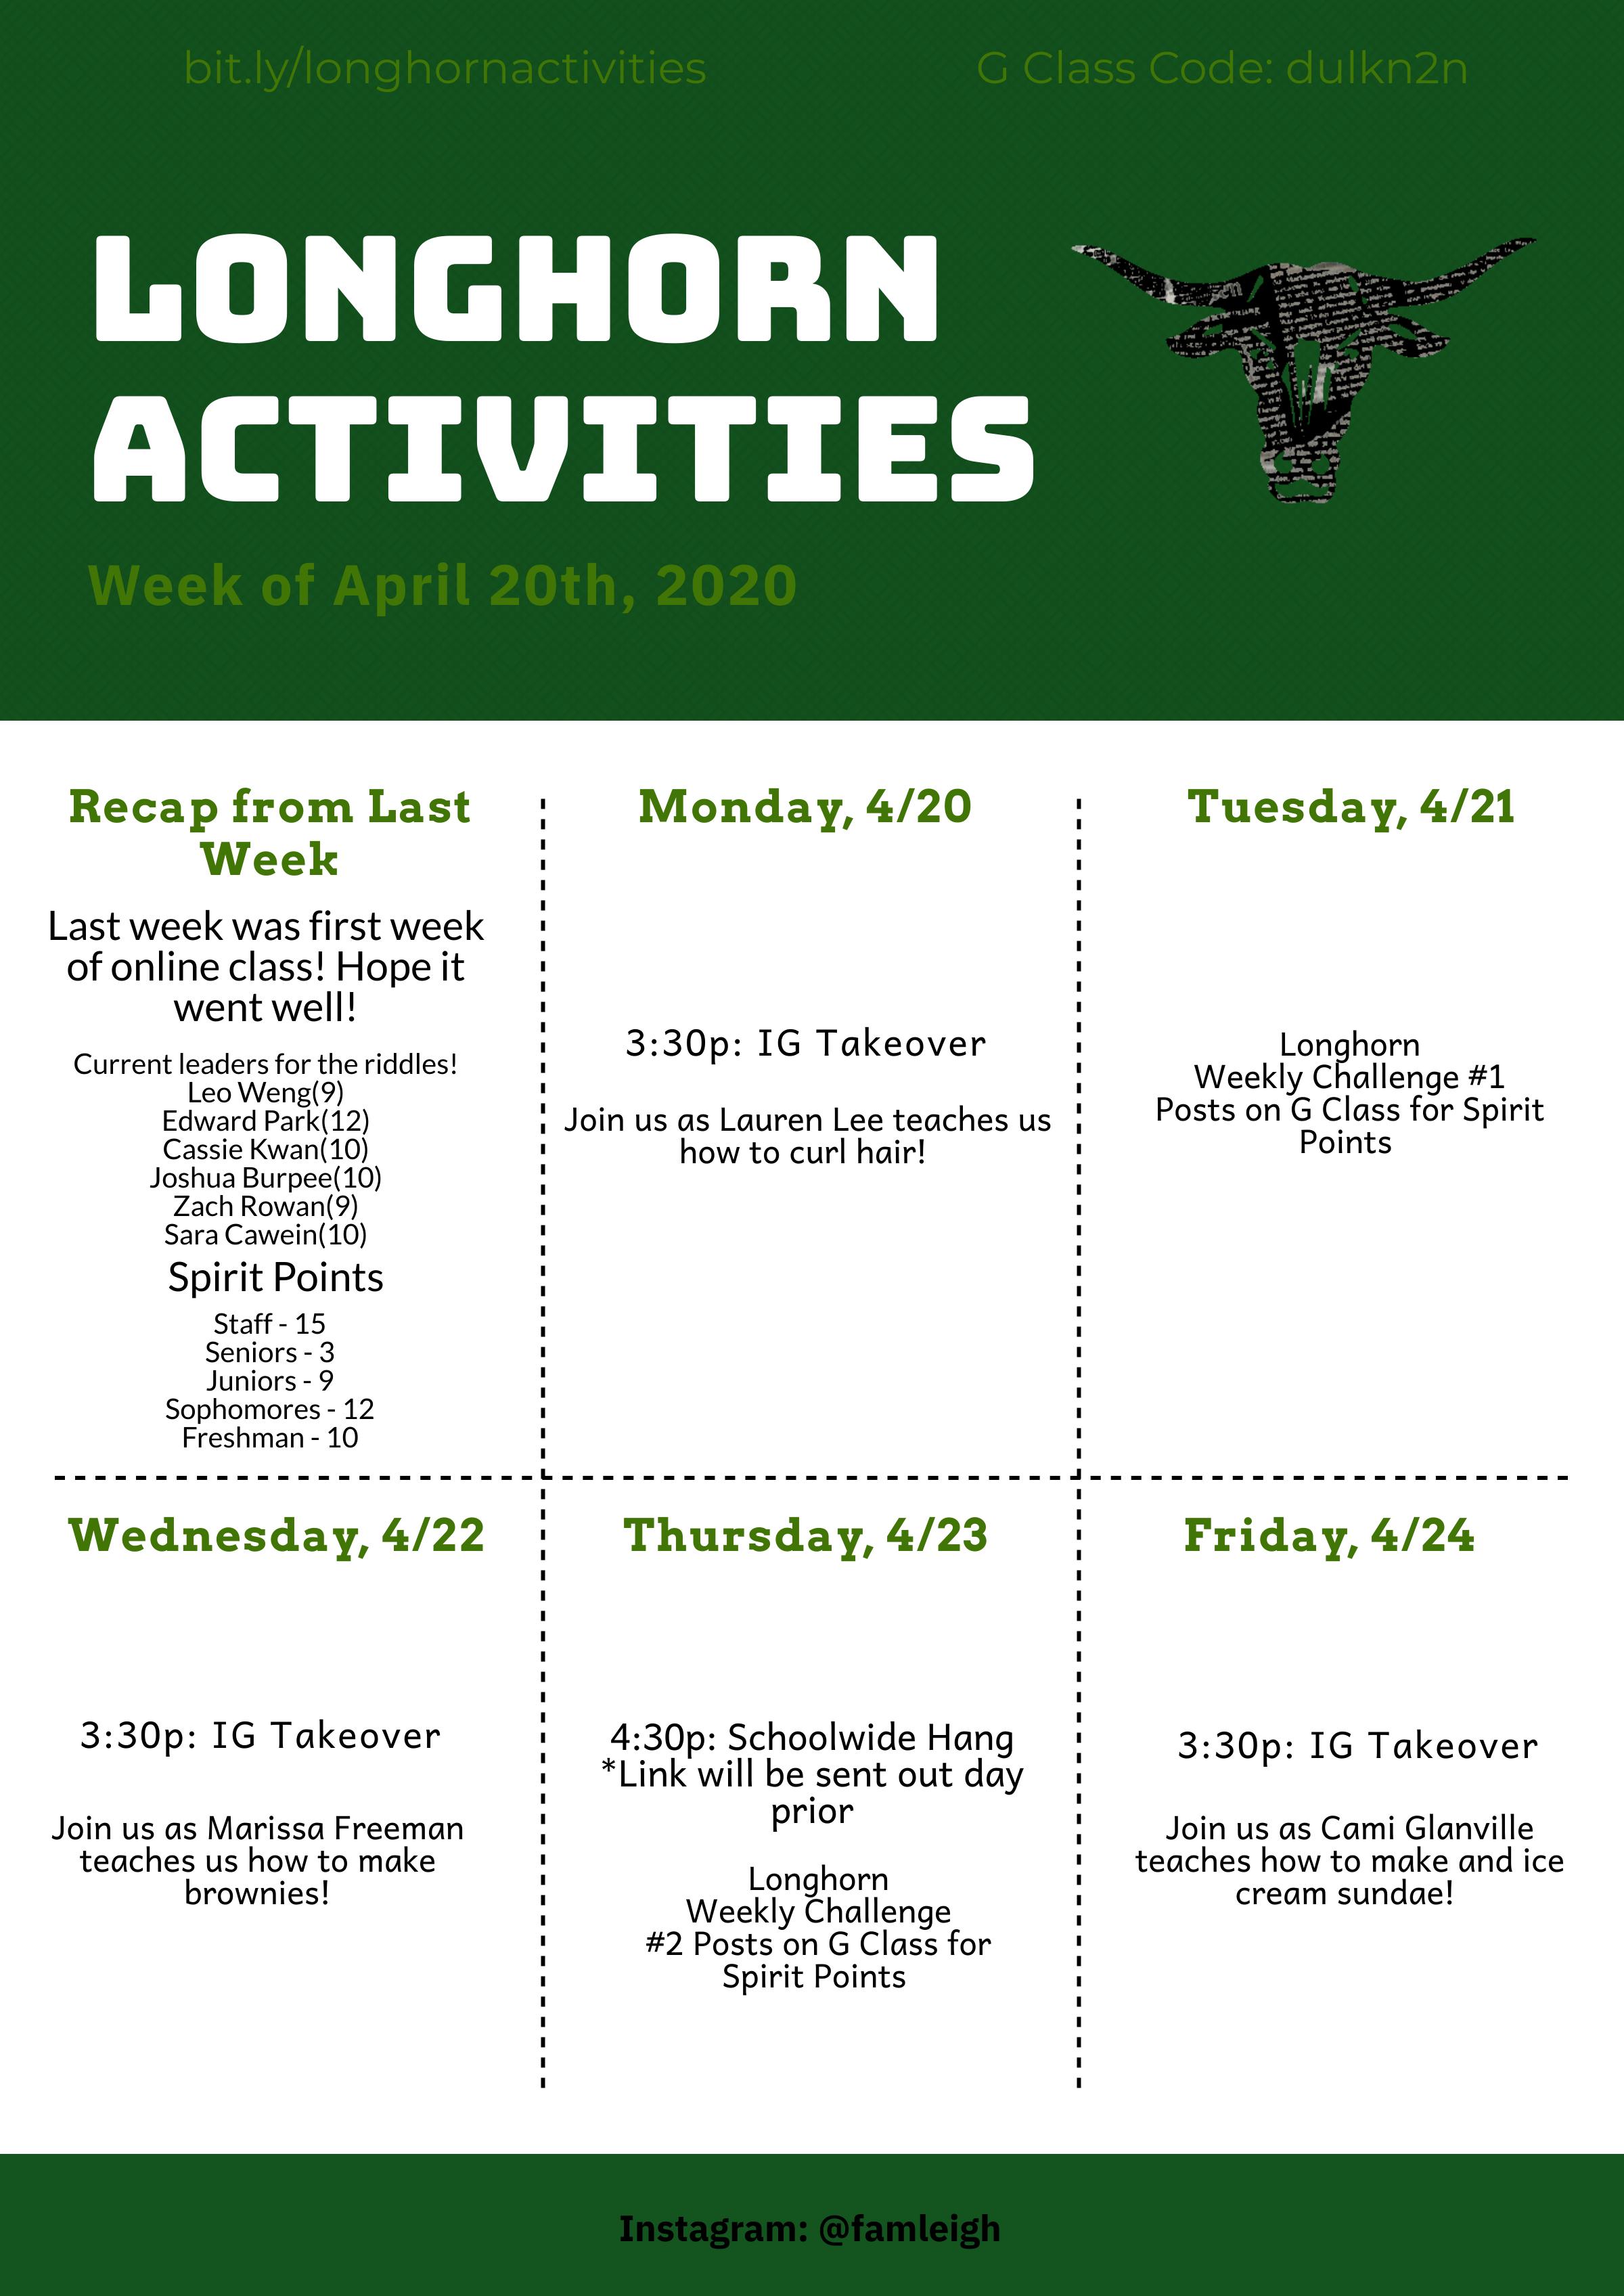 April 20th Activities